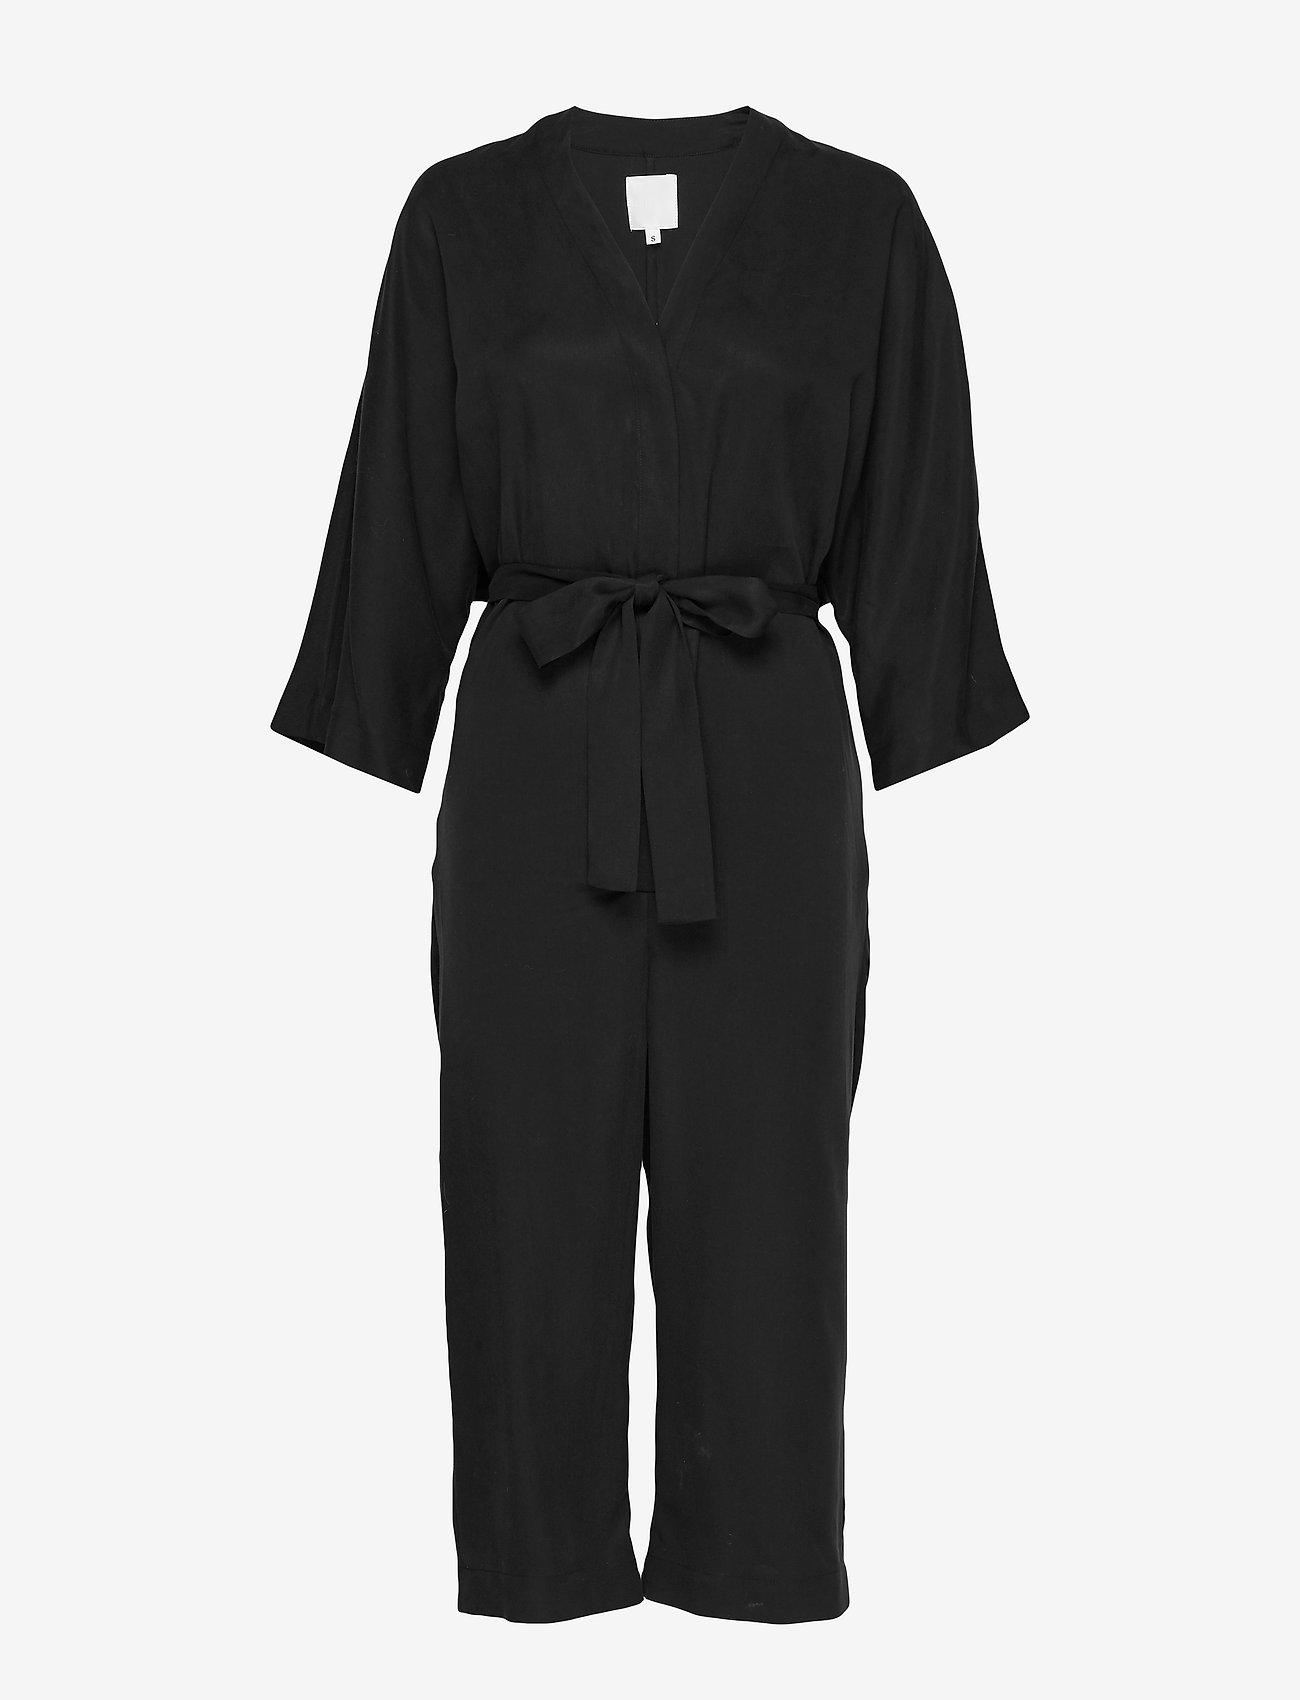 hálo - TUNDRA kimono overall - kleding - black - 0